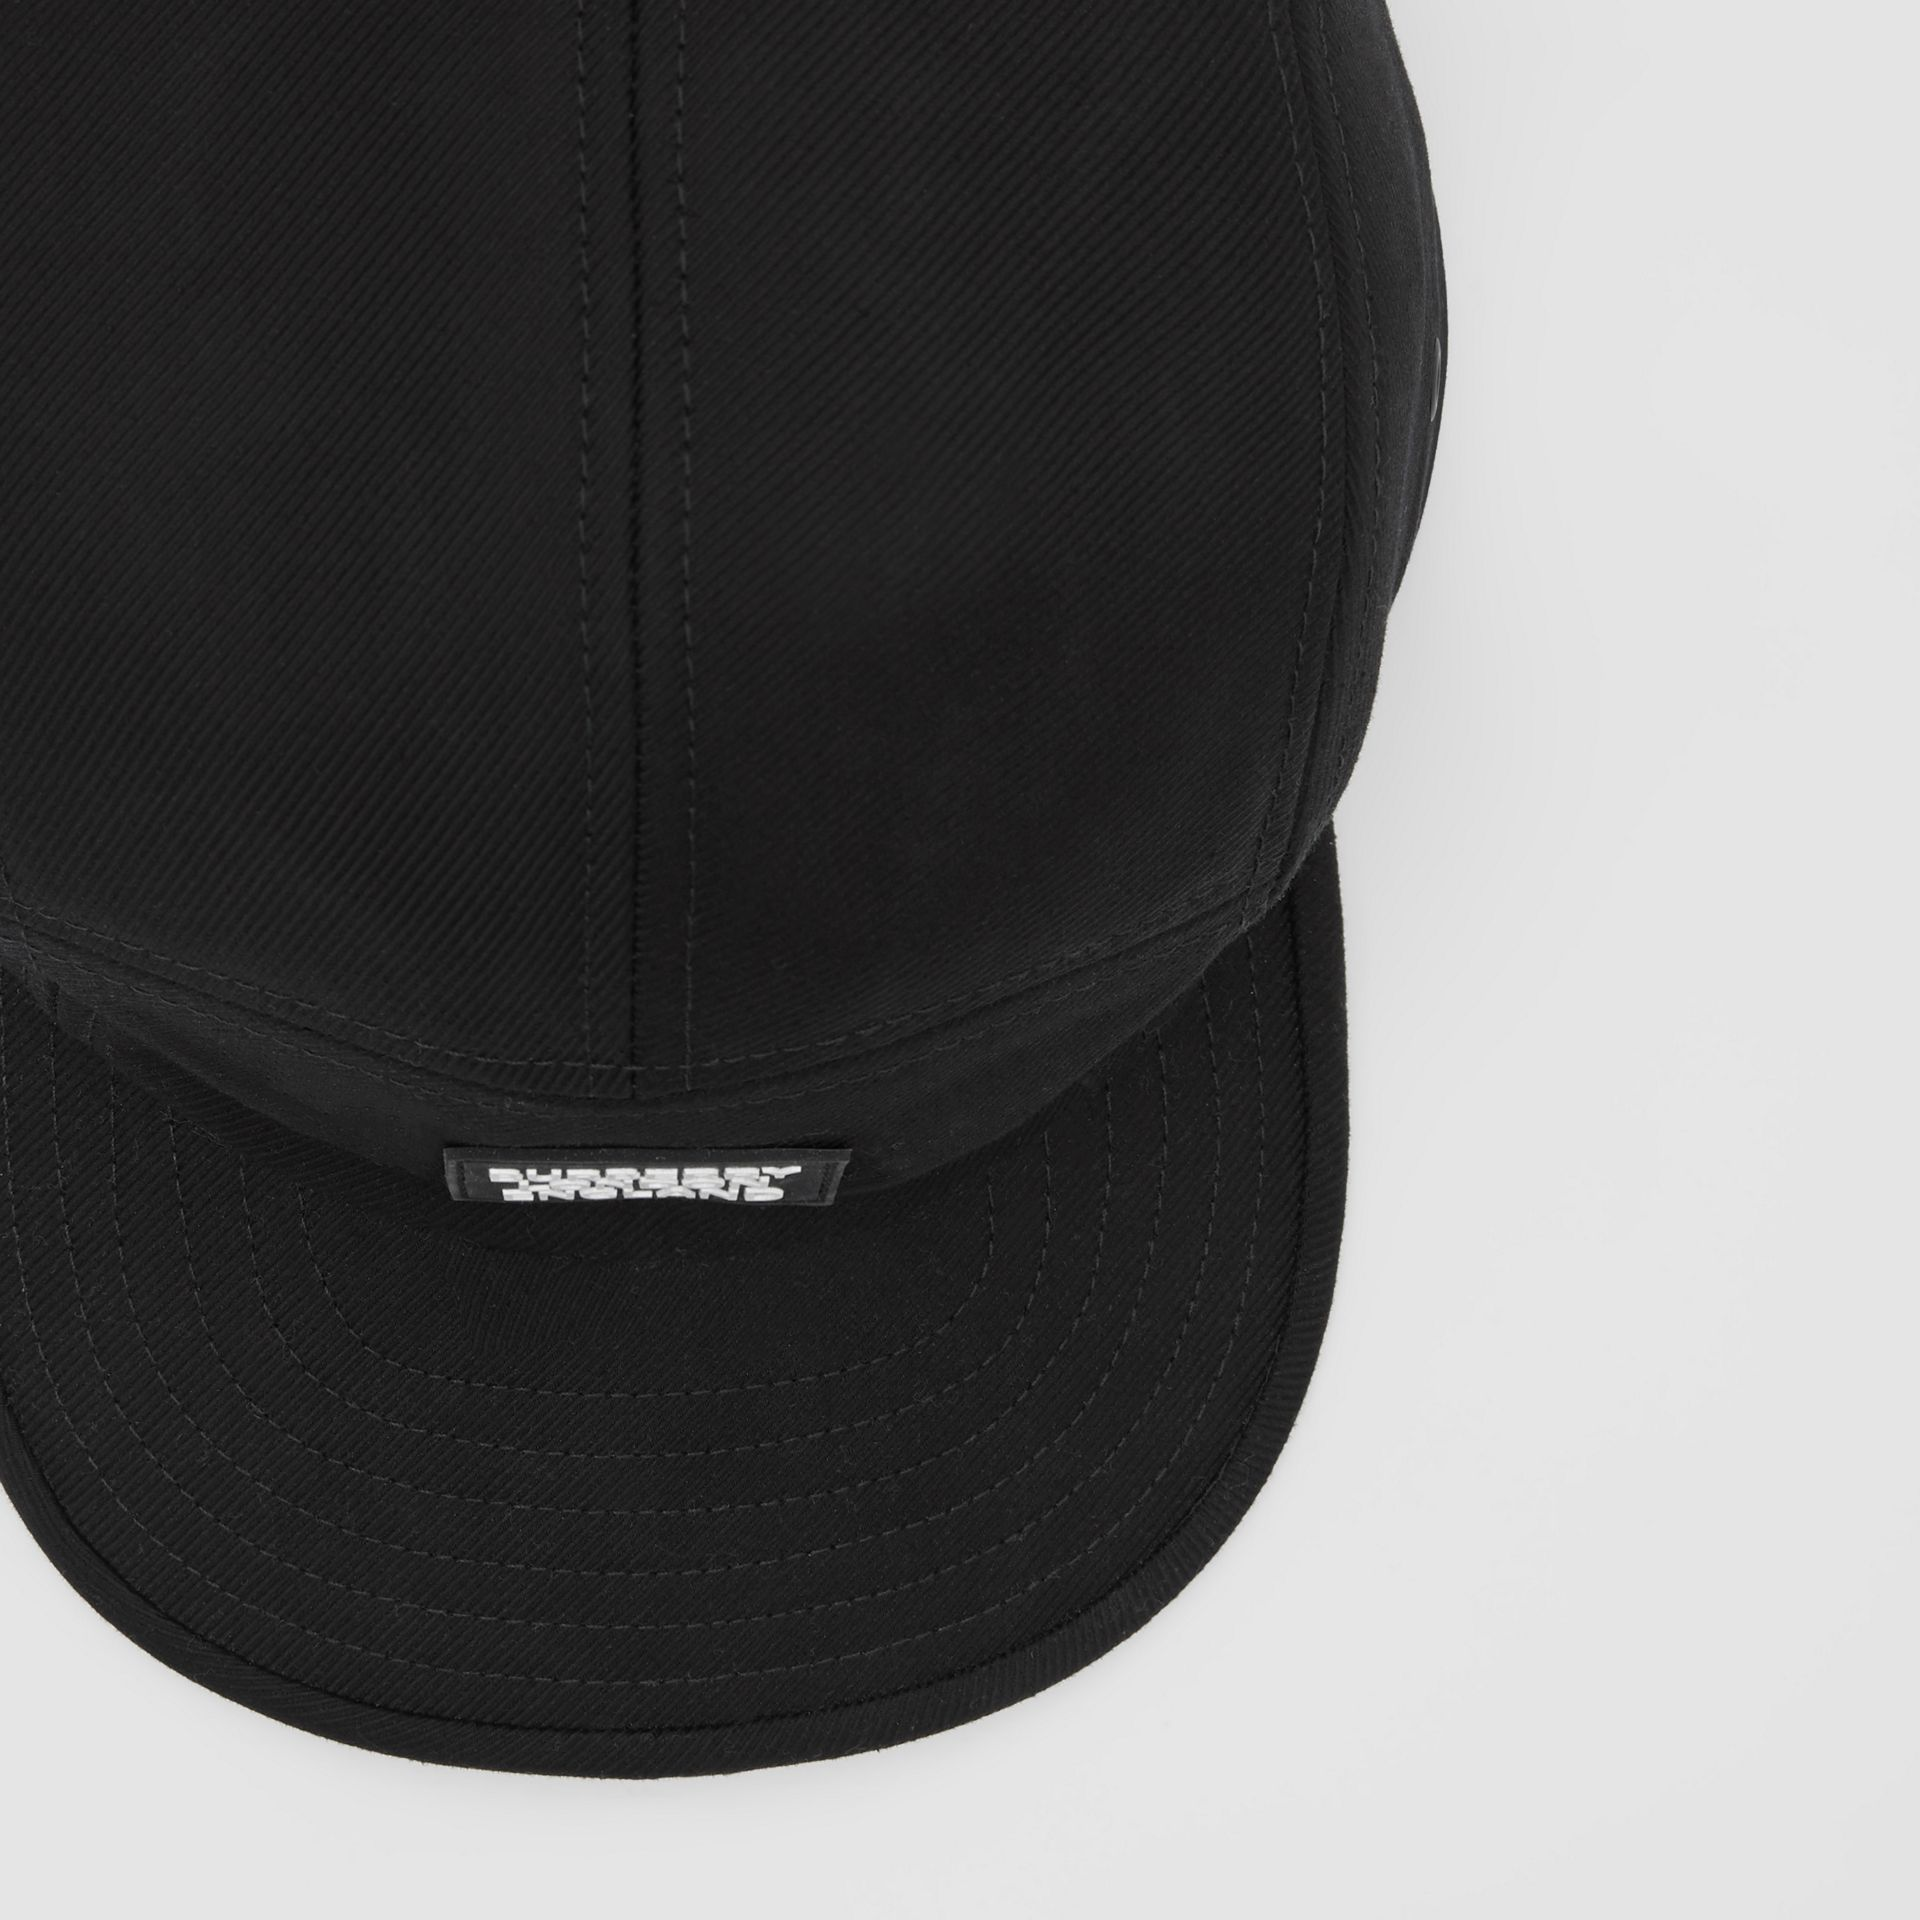 Logo Appliqué Cotton Twill Cap in Black | Burberry United States - gallery image 1